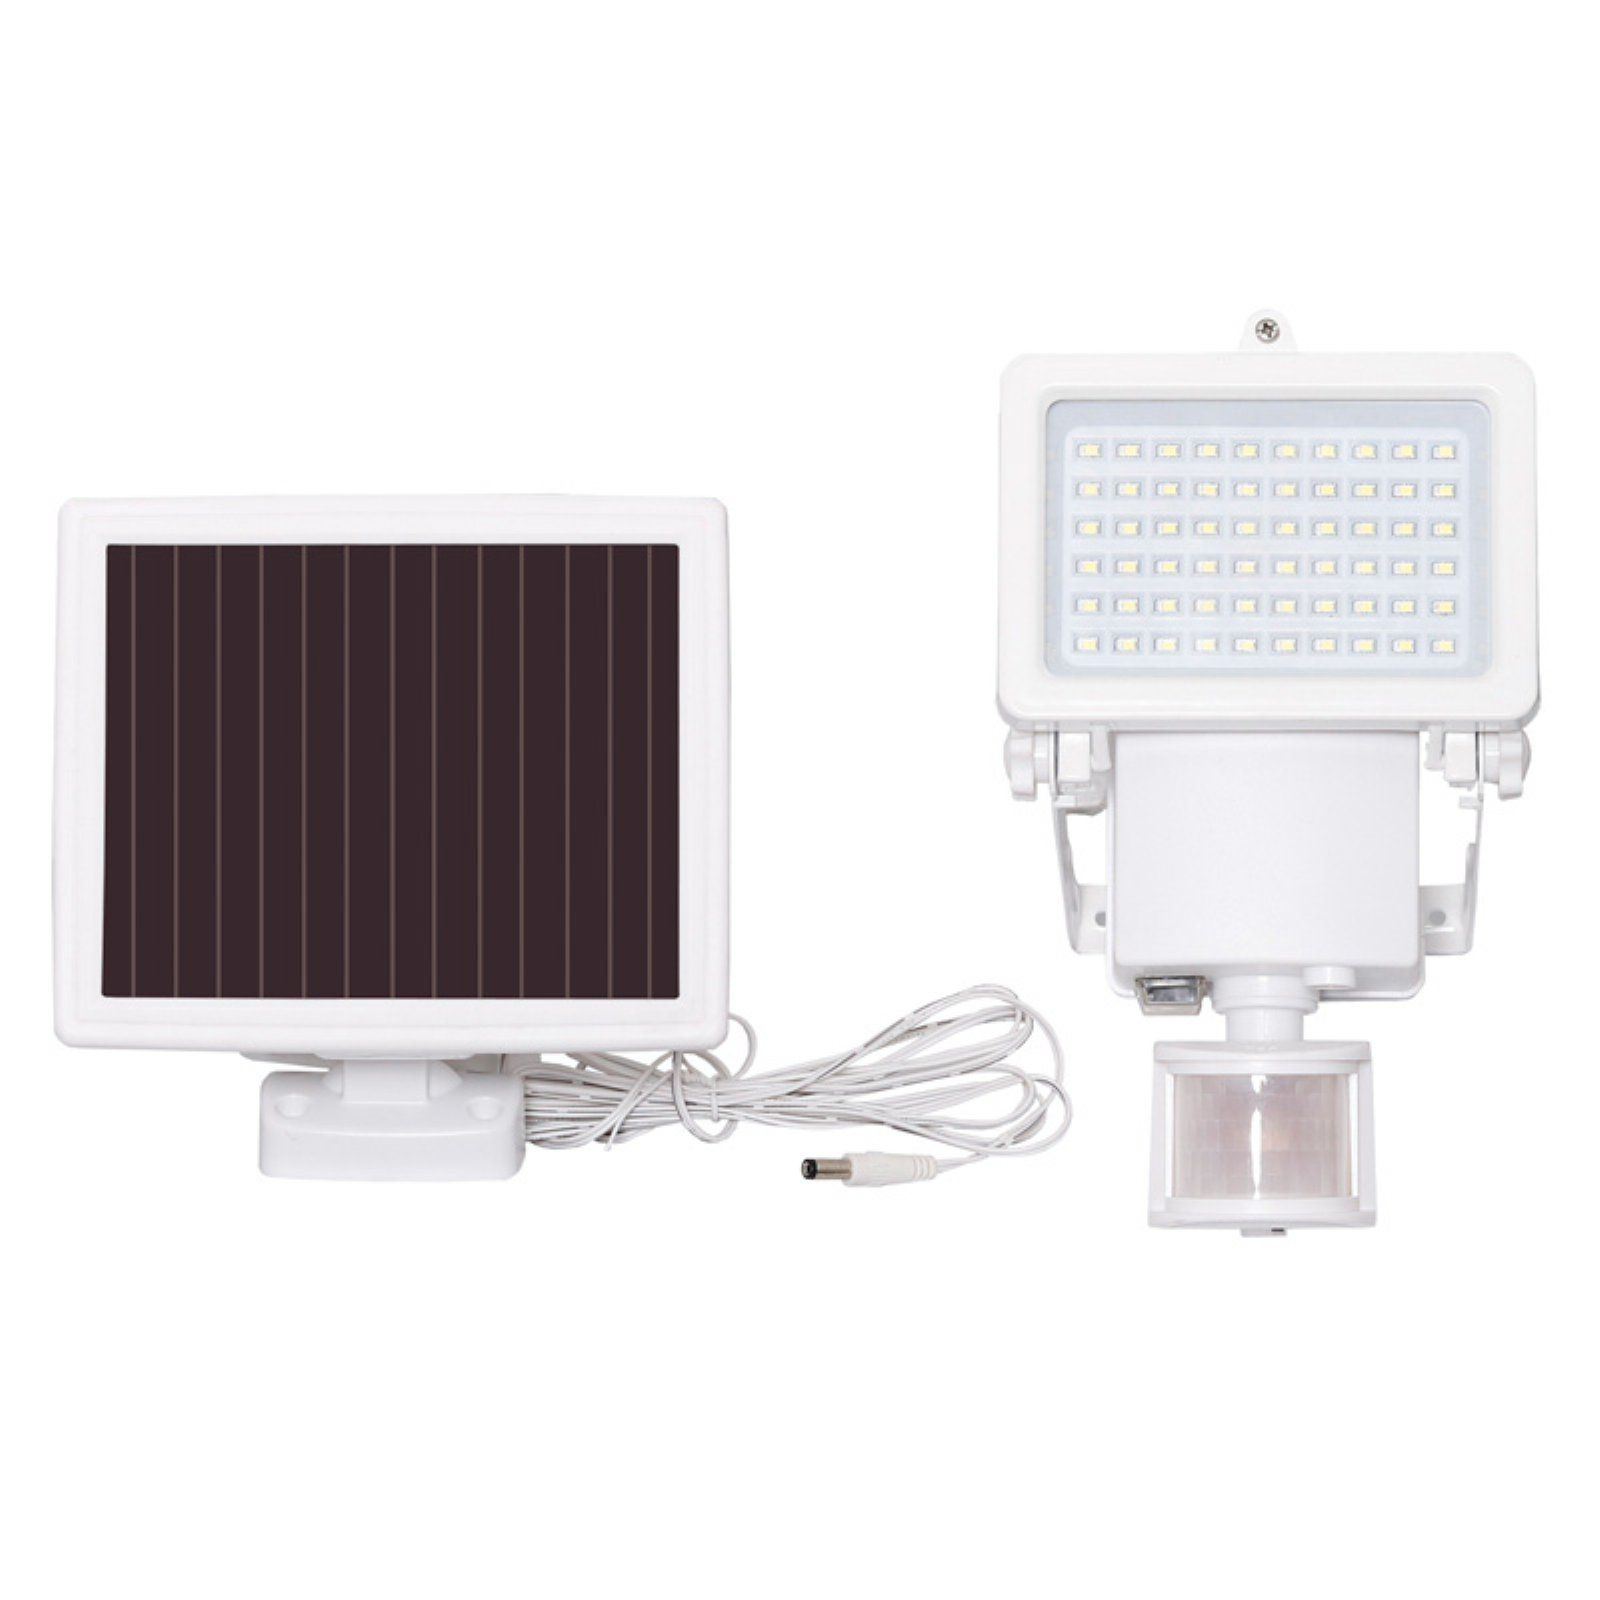 Westinghouse 60 Led 1000 Lumen Motion Sensing Solar Security Light Solar Security Light Security Lights Solar Powered Security Light